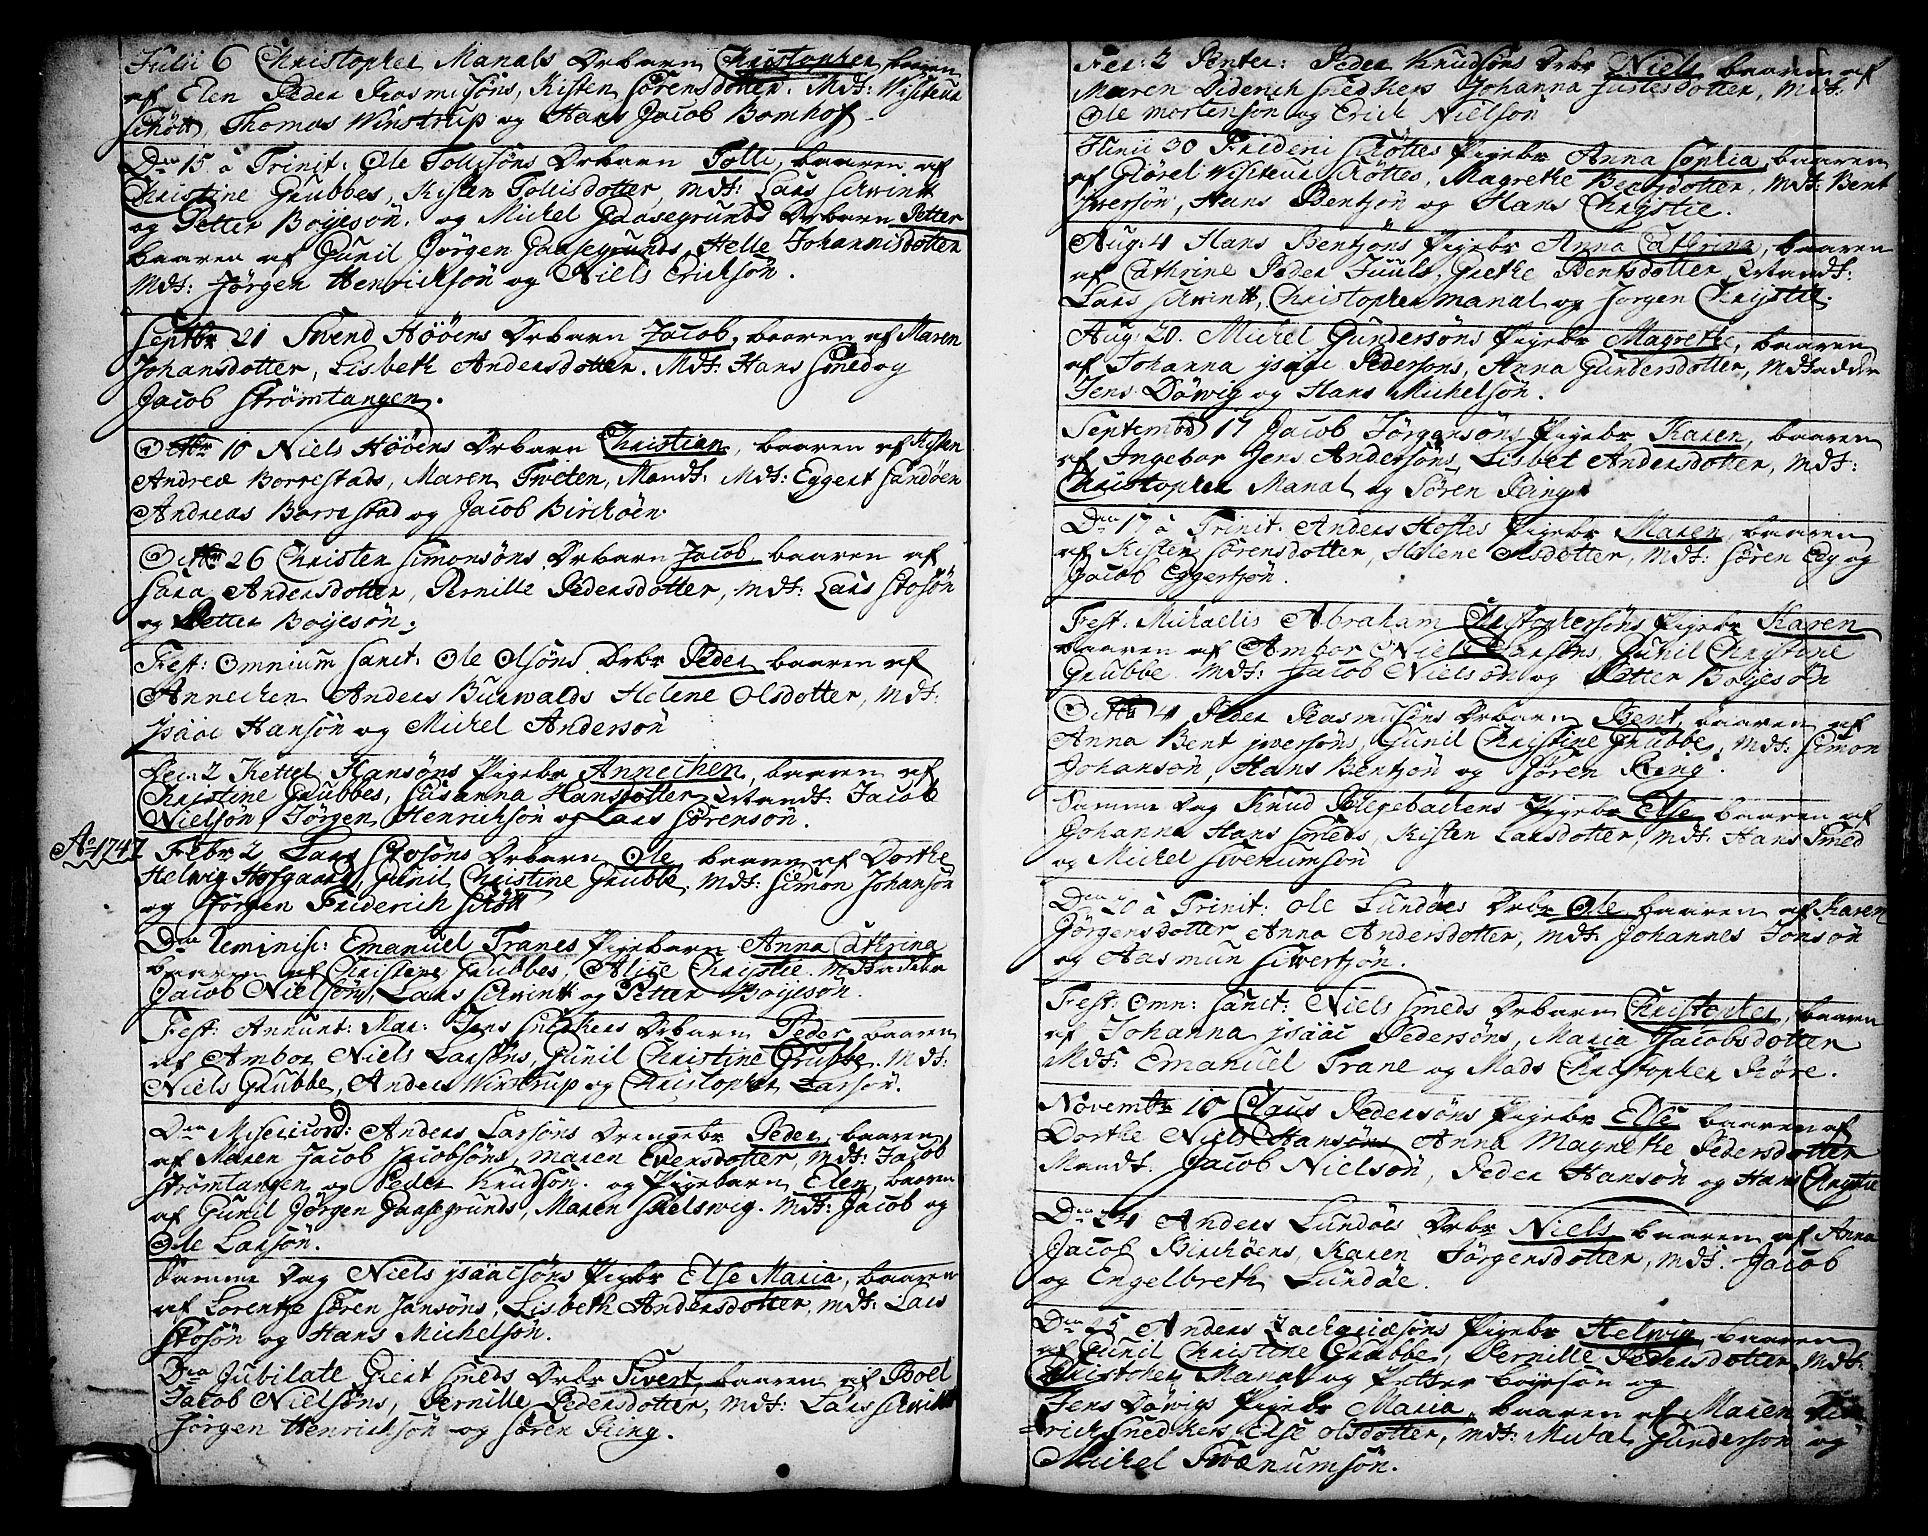 SAKO, Brevik kirkebøker, F/Fa/L0002: Ministerialbok nr. 2, 1720-1764, s. 34q